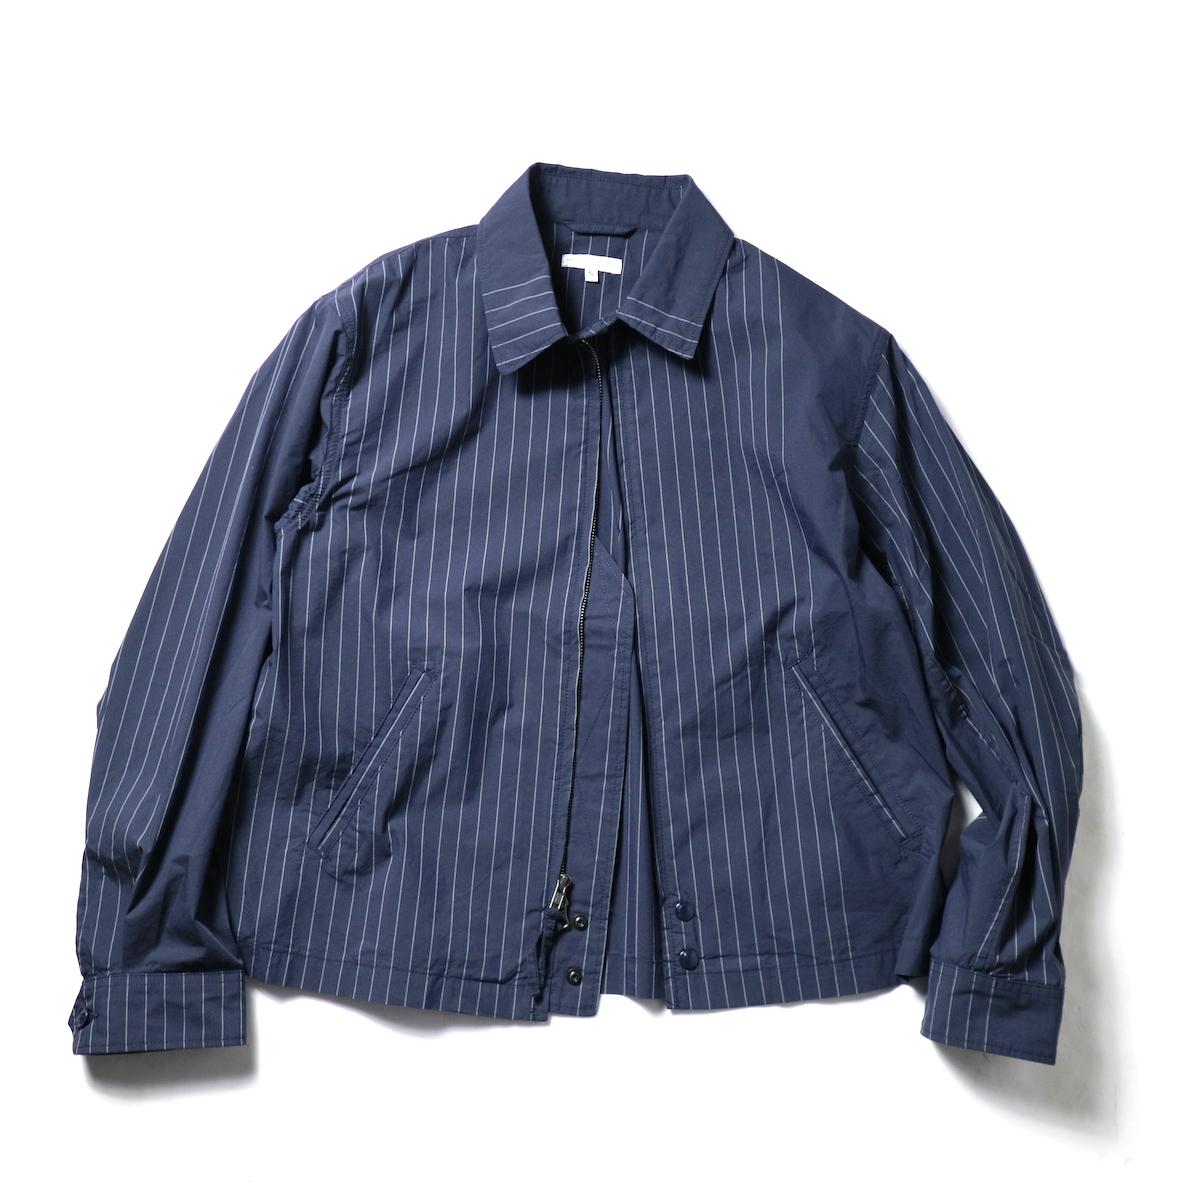 Engineered Garments / Claigton Jacket - Nyco Gangster Stripe (Dk.Navy)